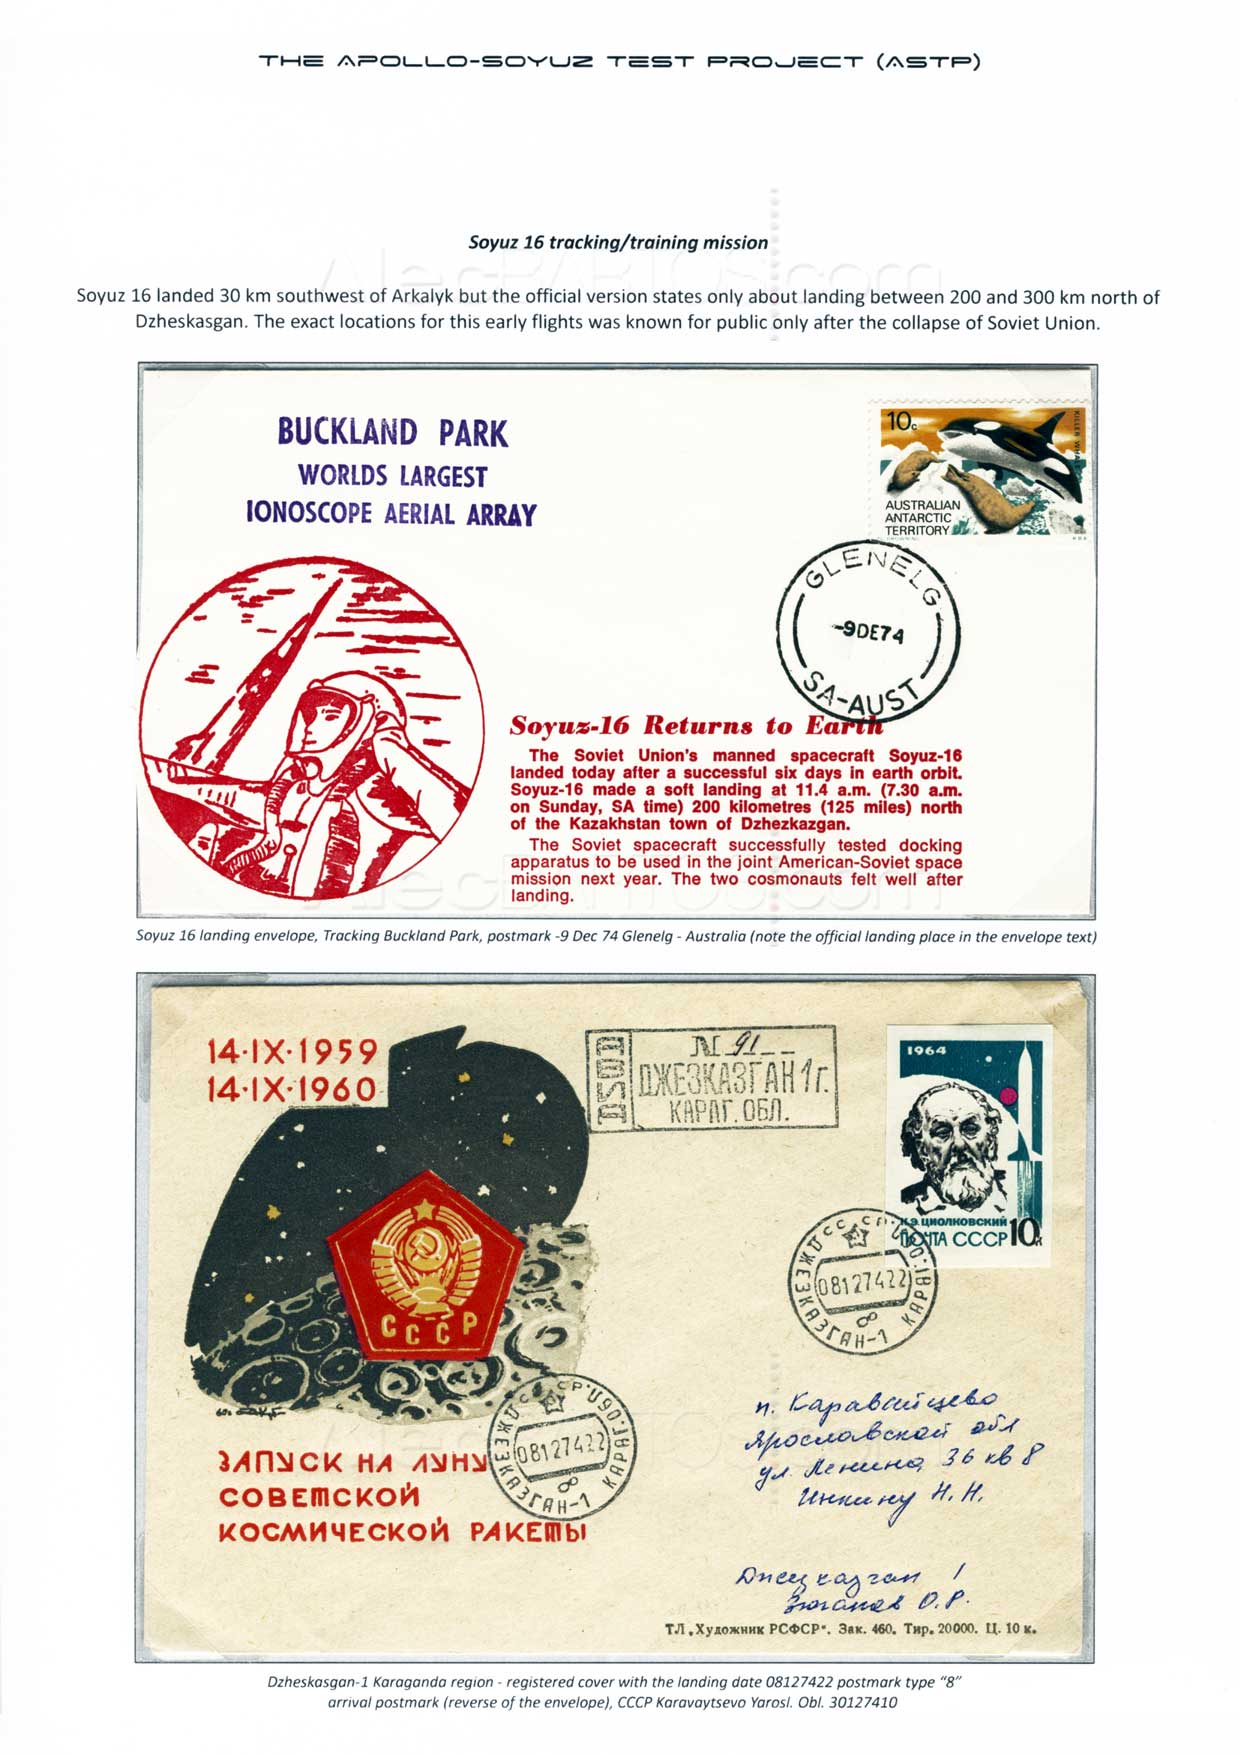 soviets_international_manned_spaceflights_alec_bartos_astp_p4-copy